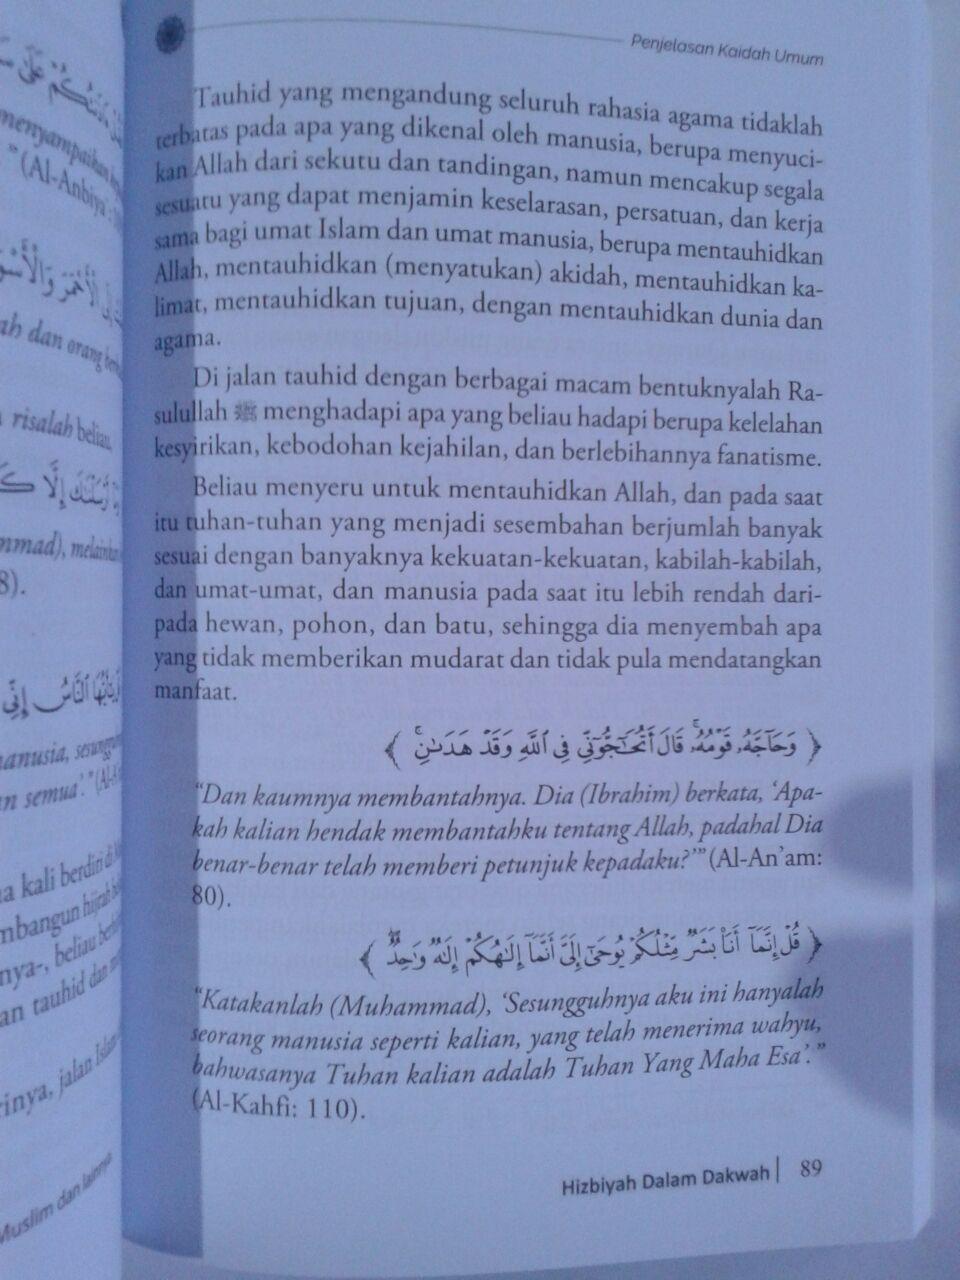 Buku Perlukan Hizbiyah Dalam Dakwah isi